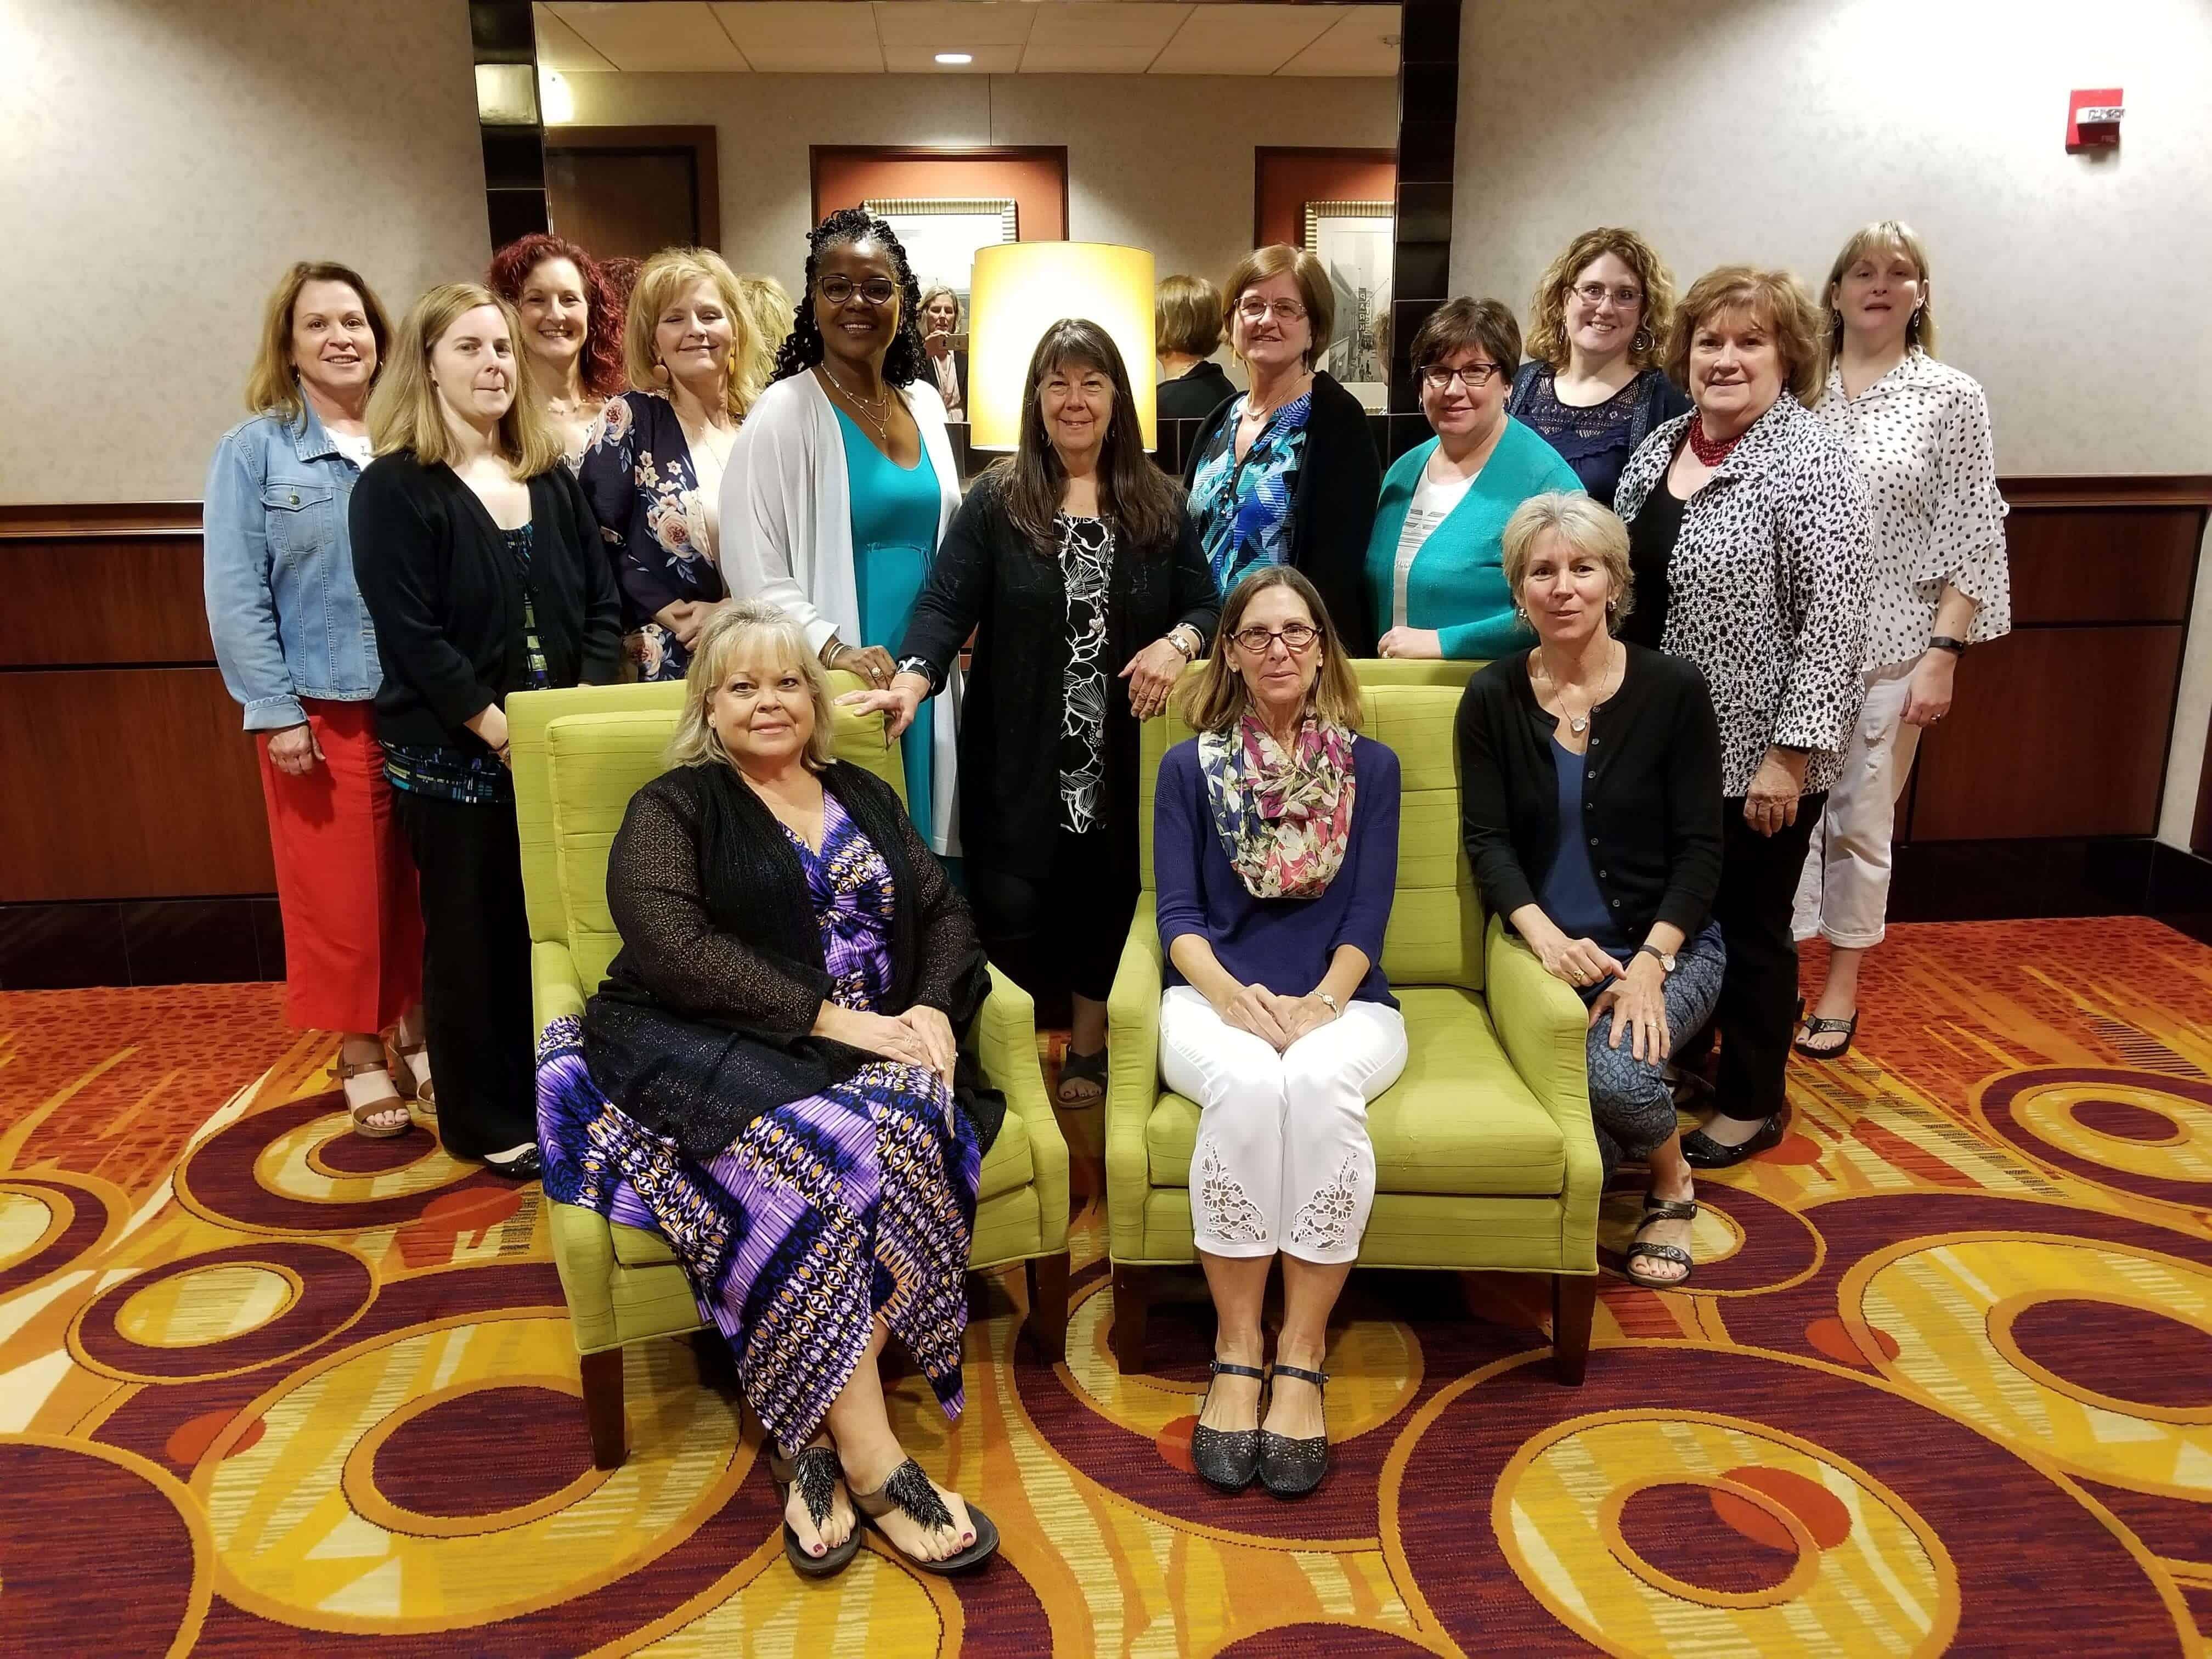 group photo of PCNA nurse leaders